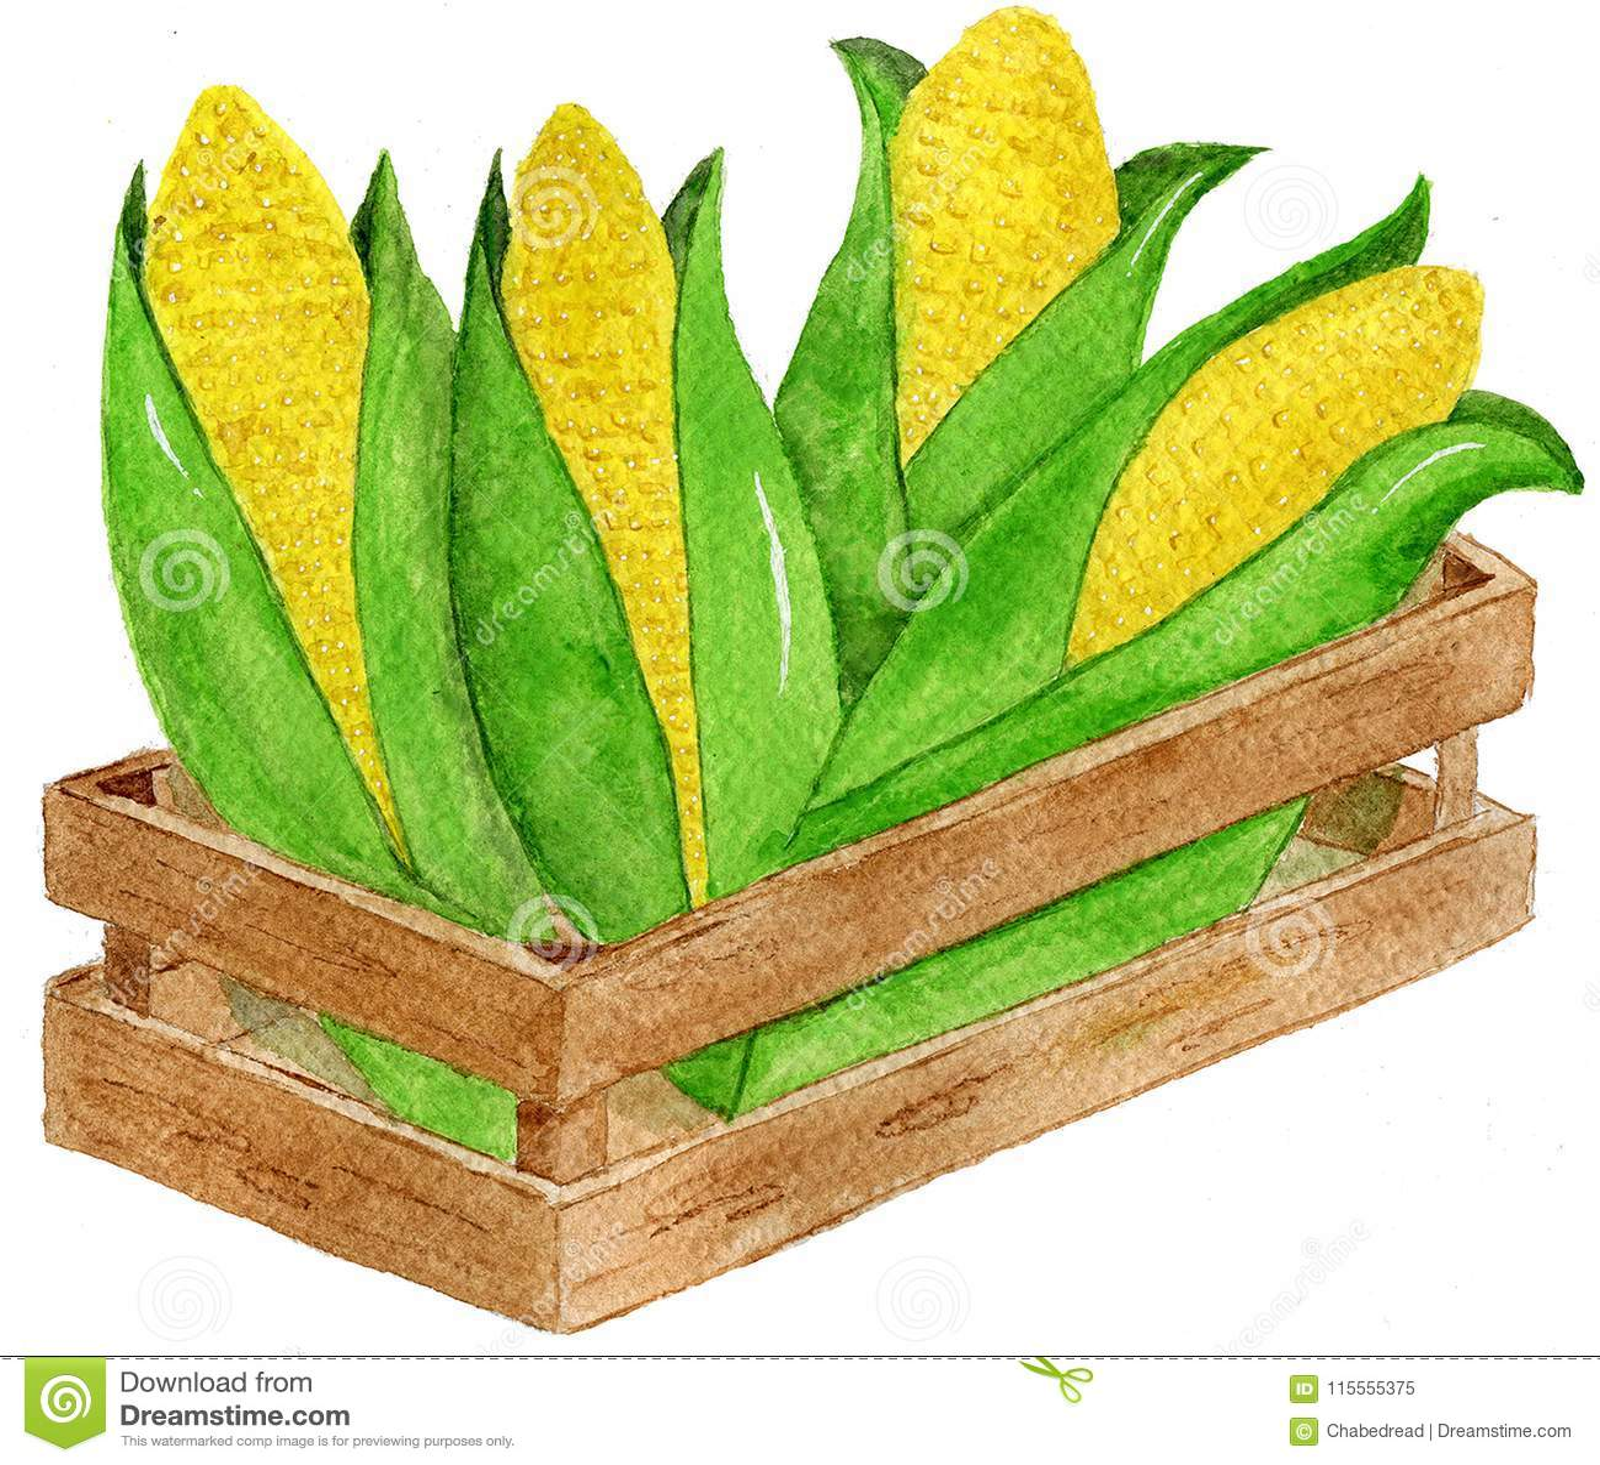 Delicious Mexican corn